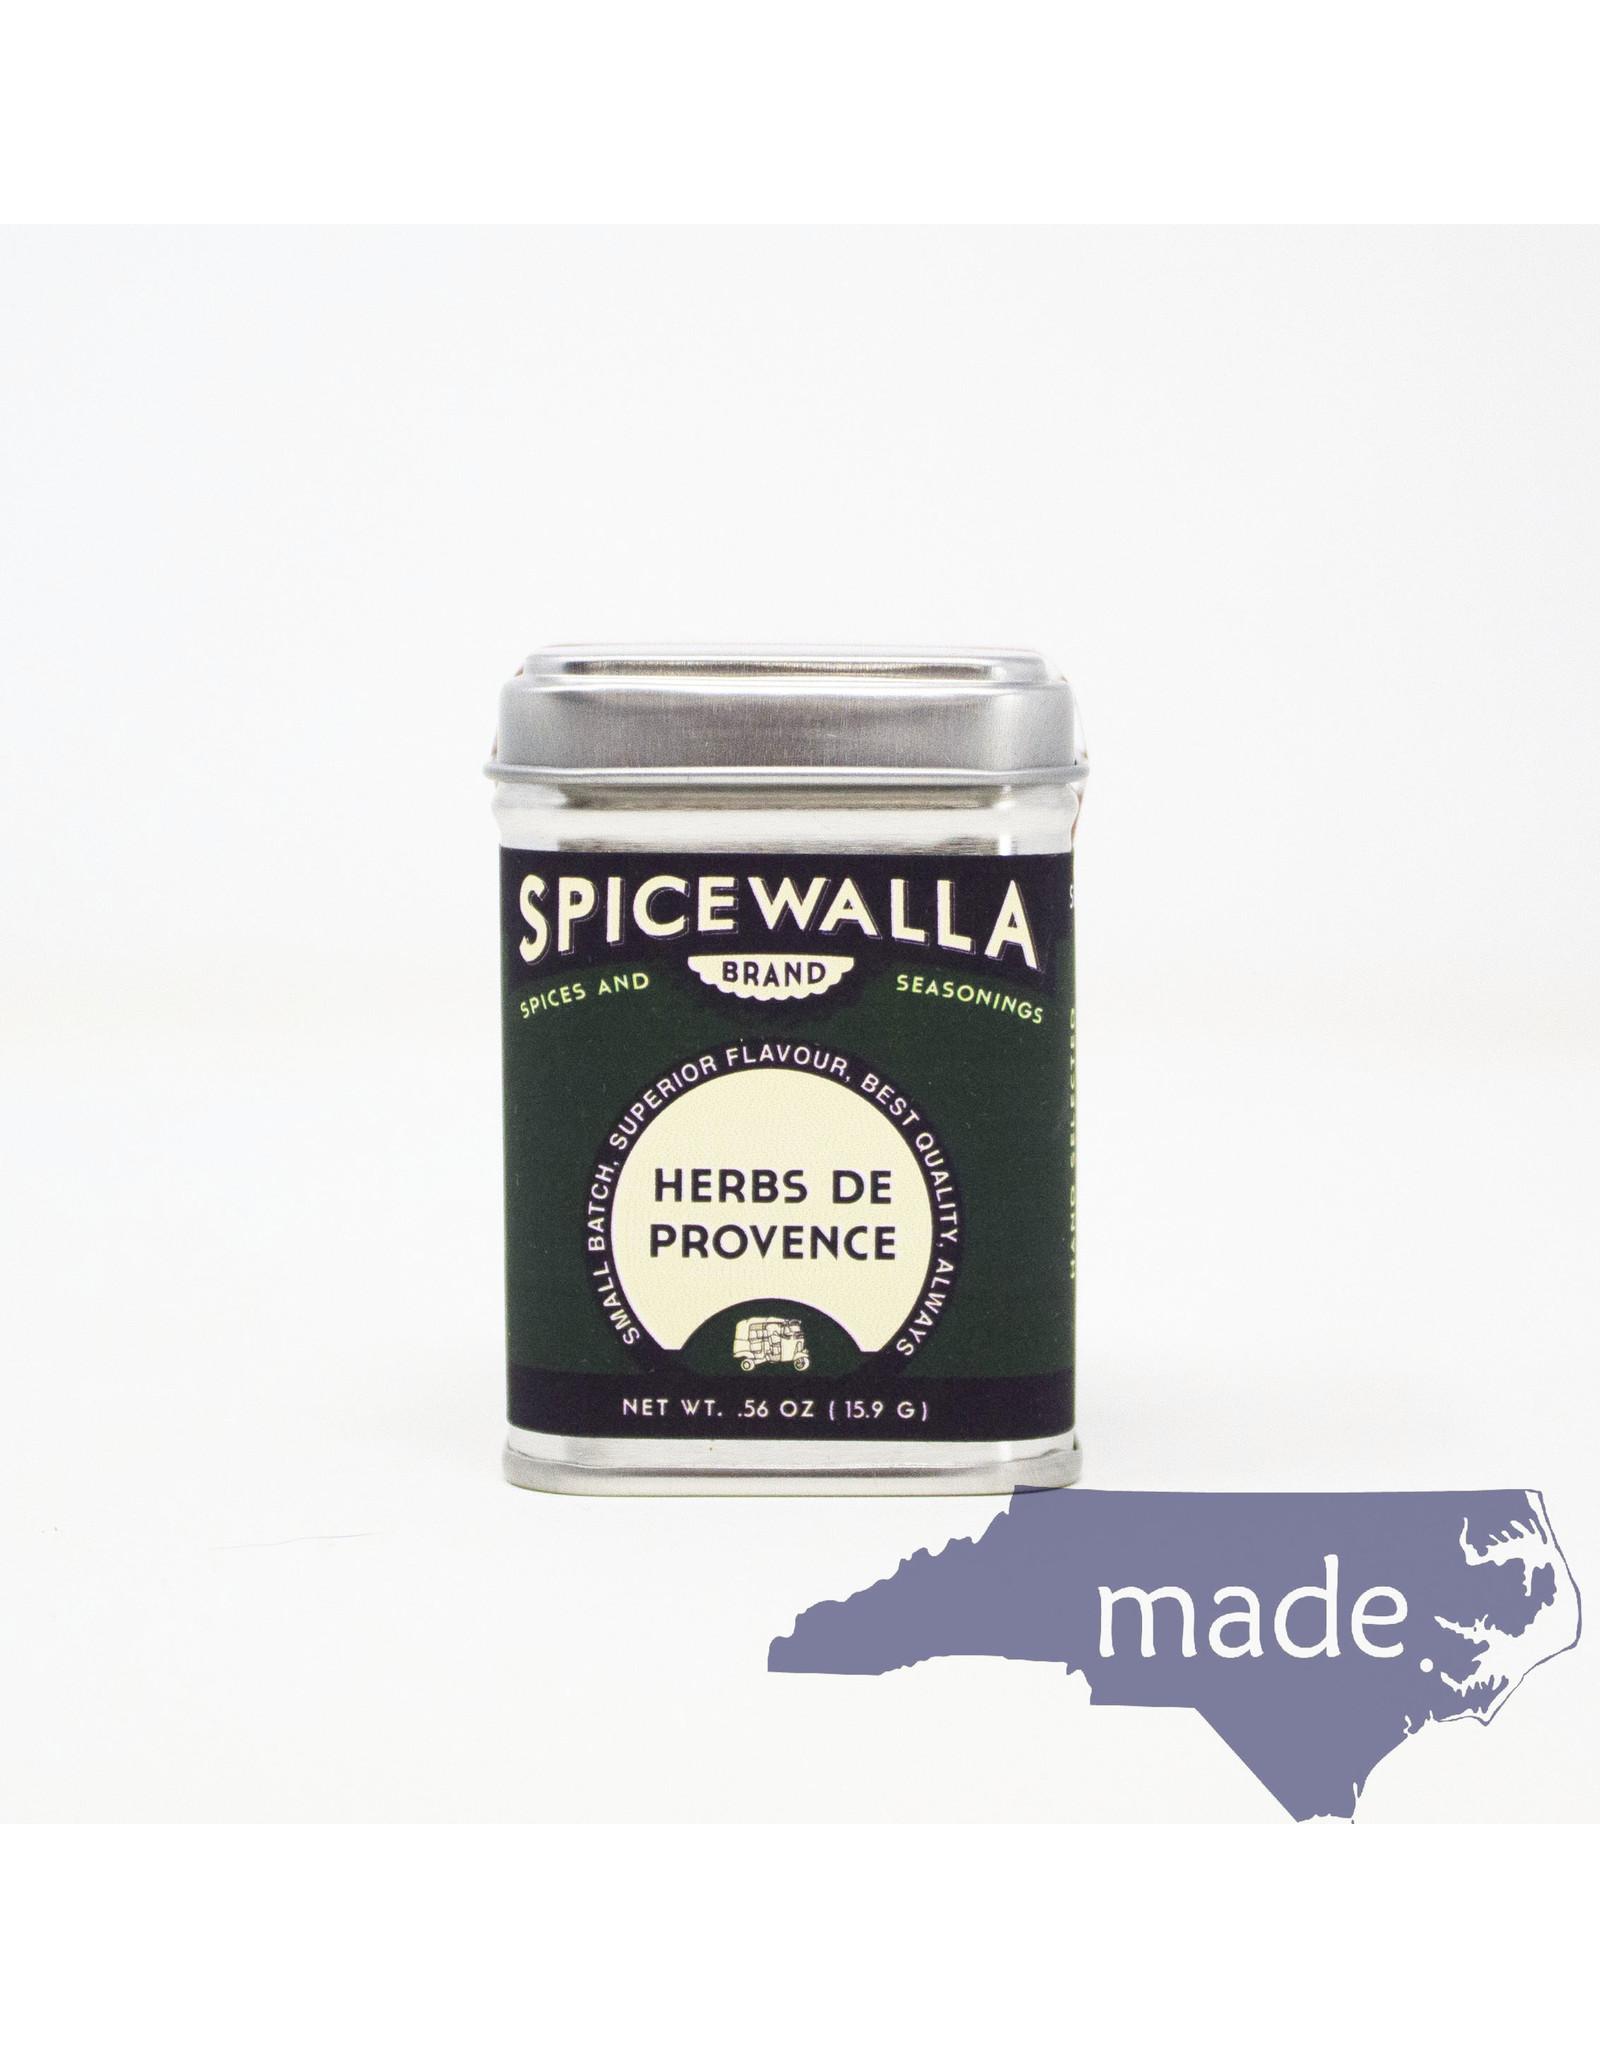 Spicewalla Herbs de Provence - Spicewalla